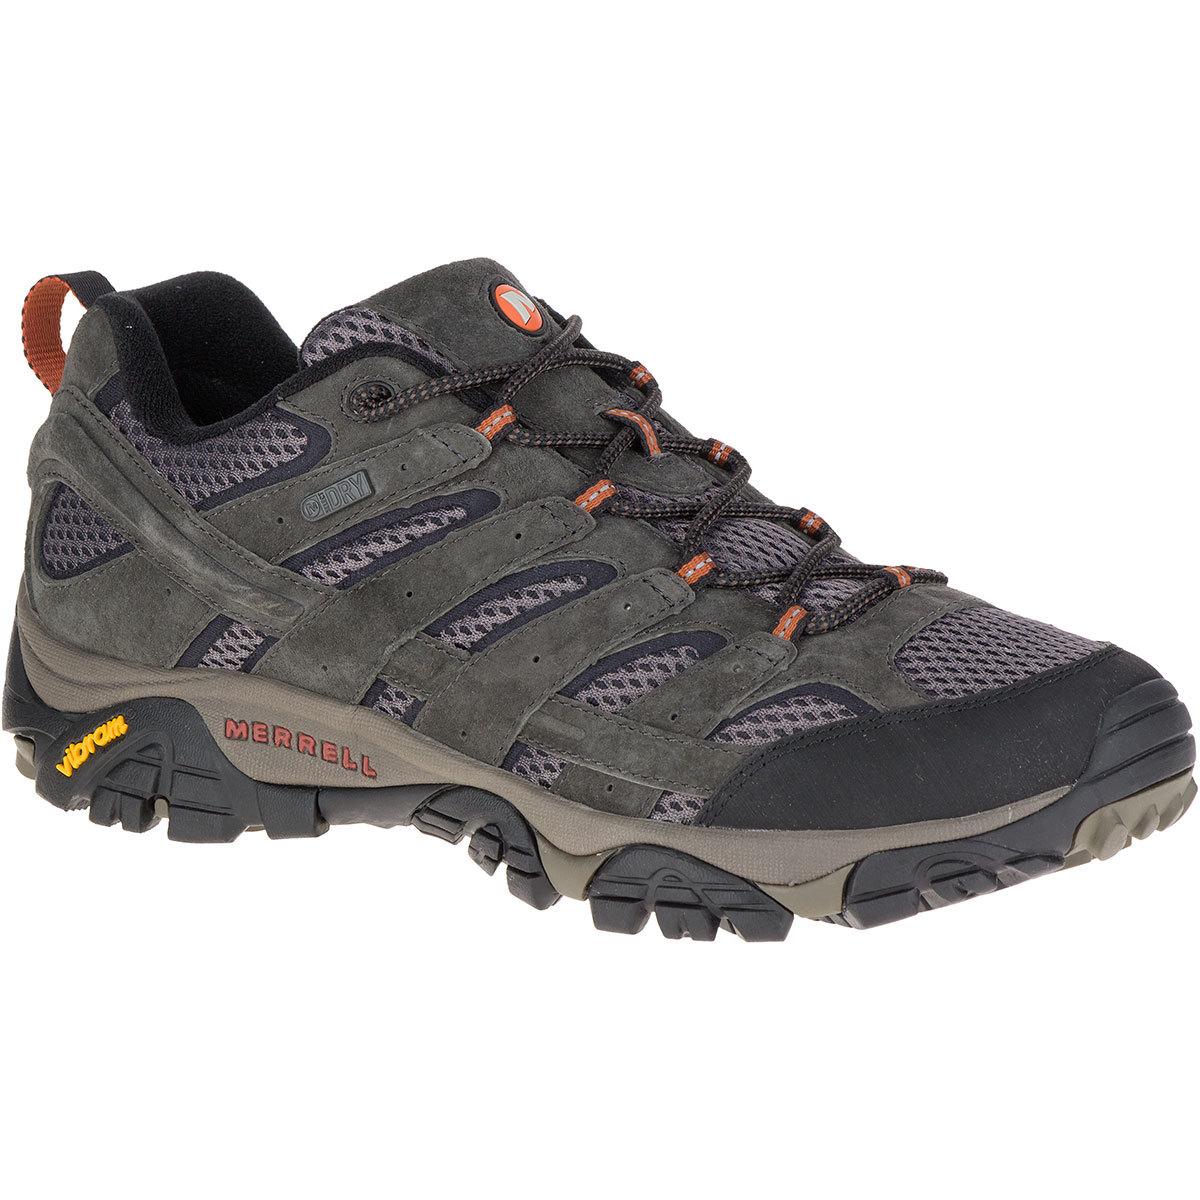 Merrell Men's Moab 2 Waterproof Hiking Shoes, Beluga - Black, 9